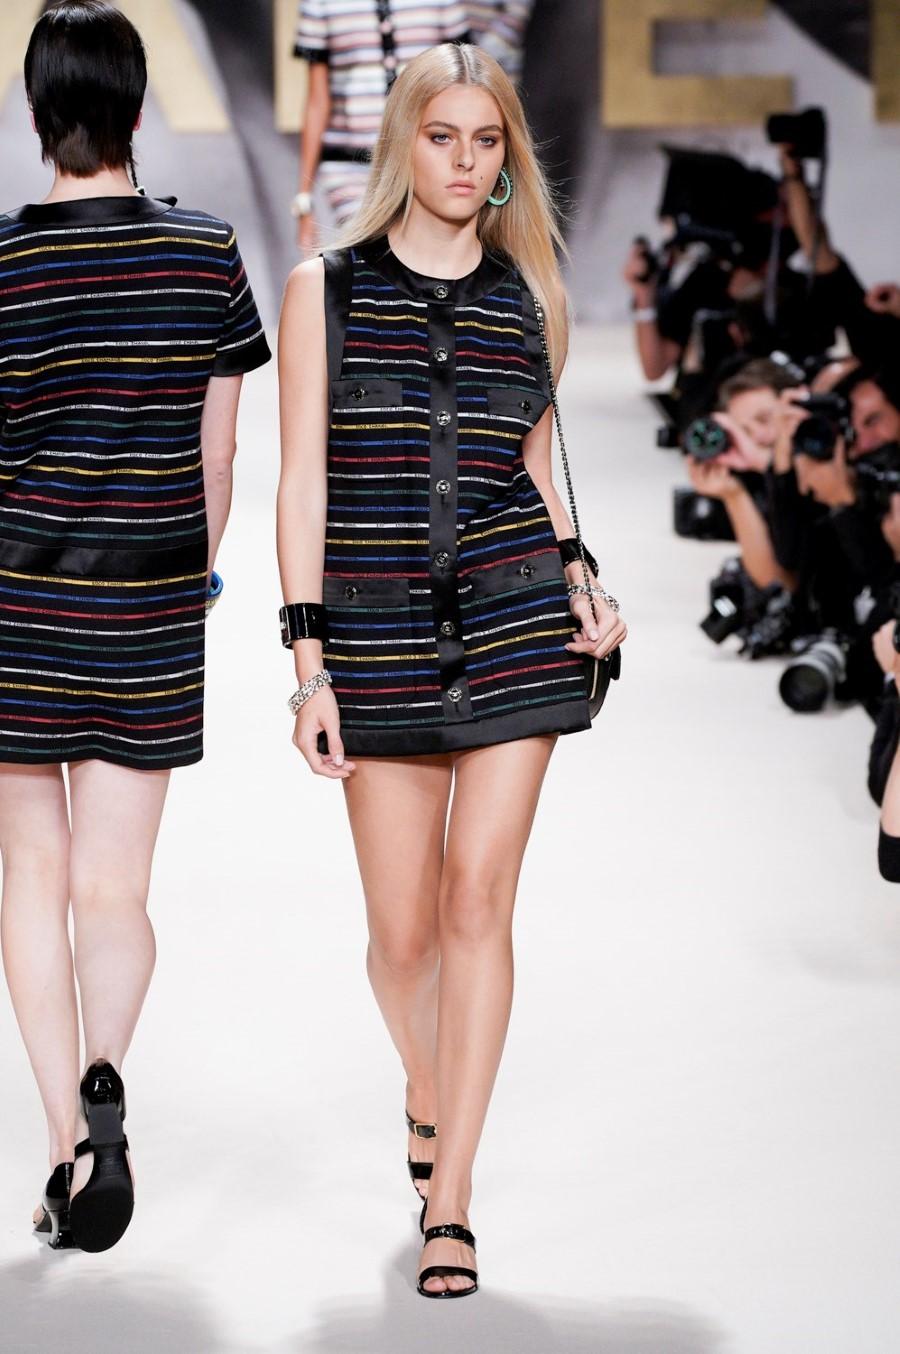 Chanel Spring Summer 2022 - Paris Chanel Spring Summer 2022 - Paris Fashion WeekFashion Week